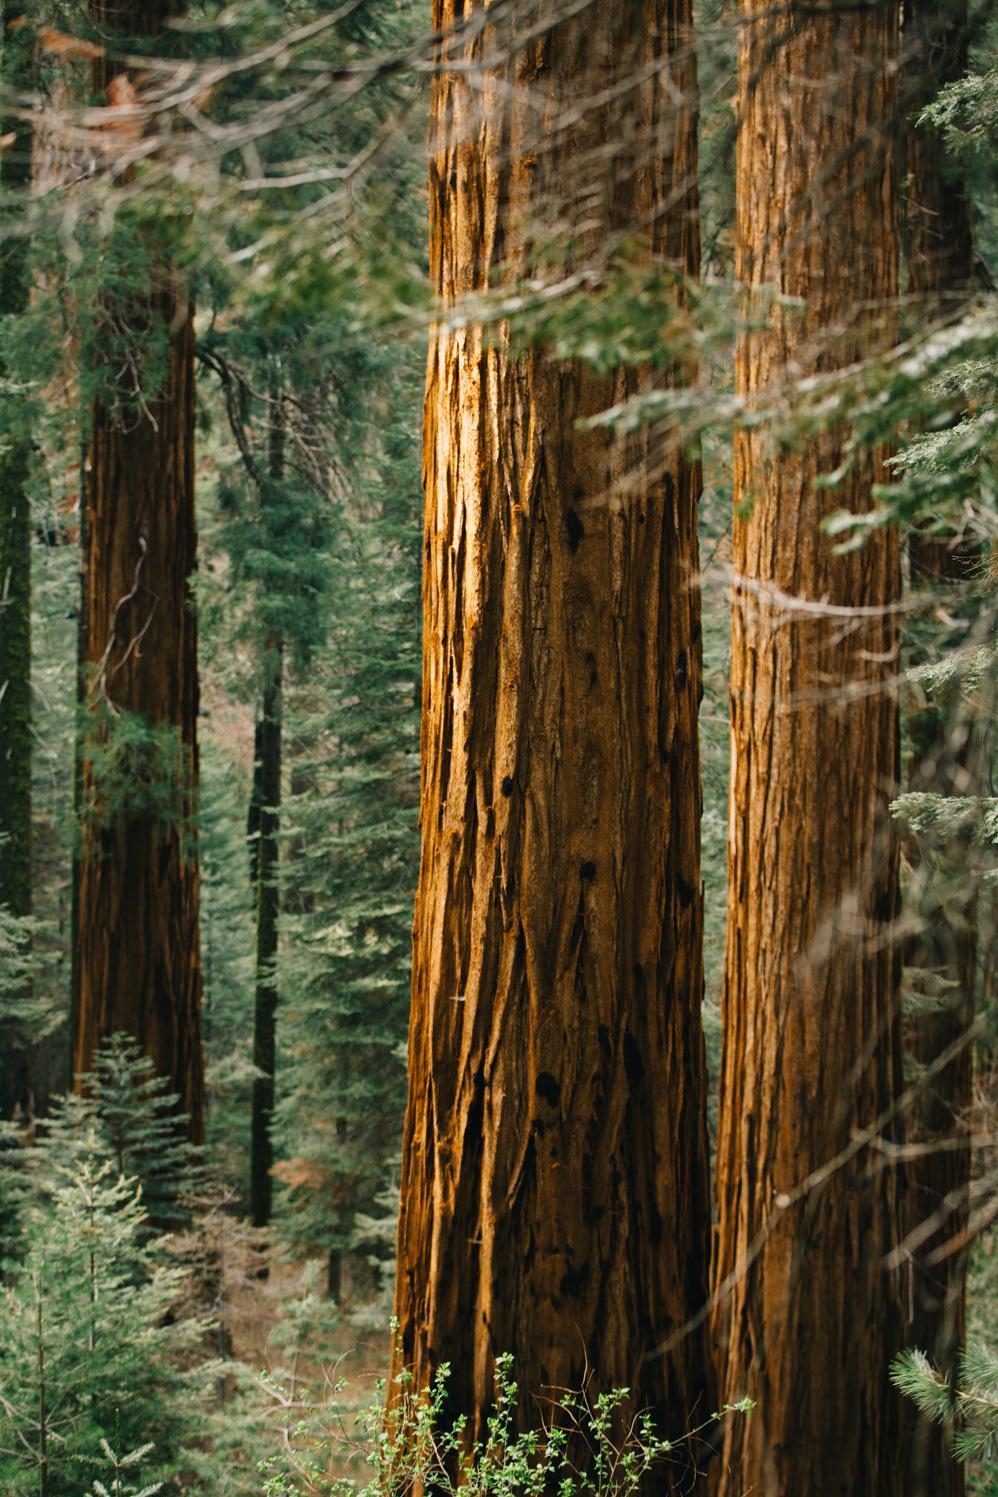 CindyGiovagnoli_Sequoia_Kings_Canyon_National_Park_spring_hiking_dogwood-004.jpg